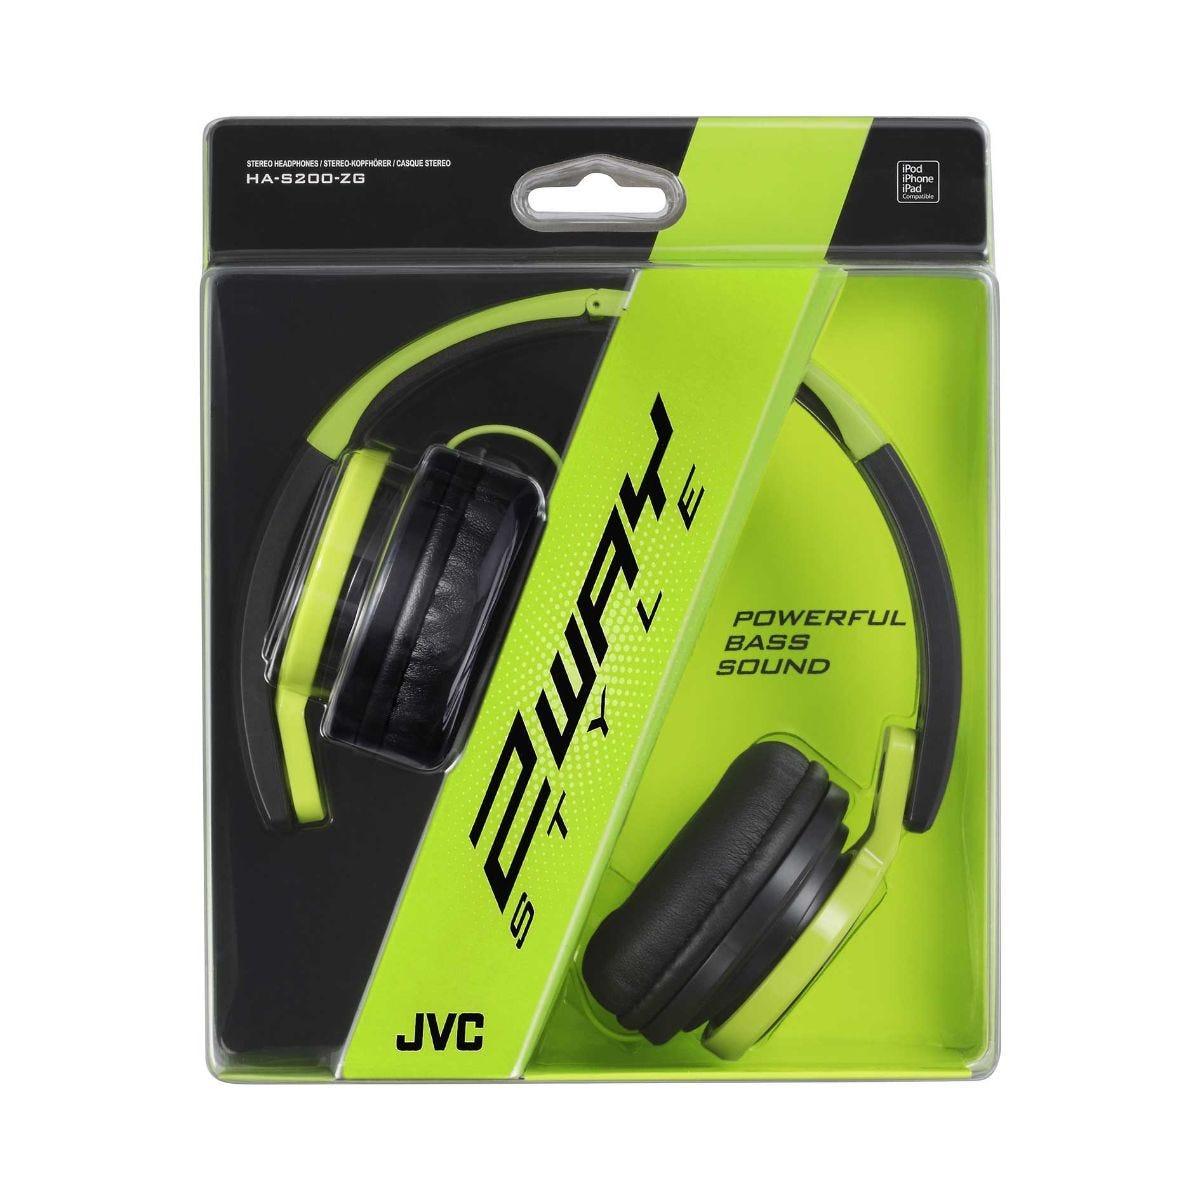 JVC S200 Headphones, Green.